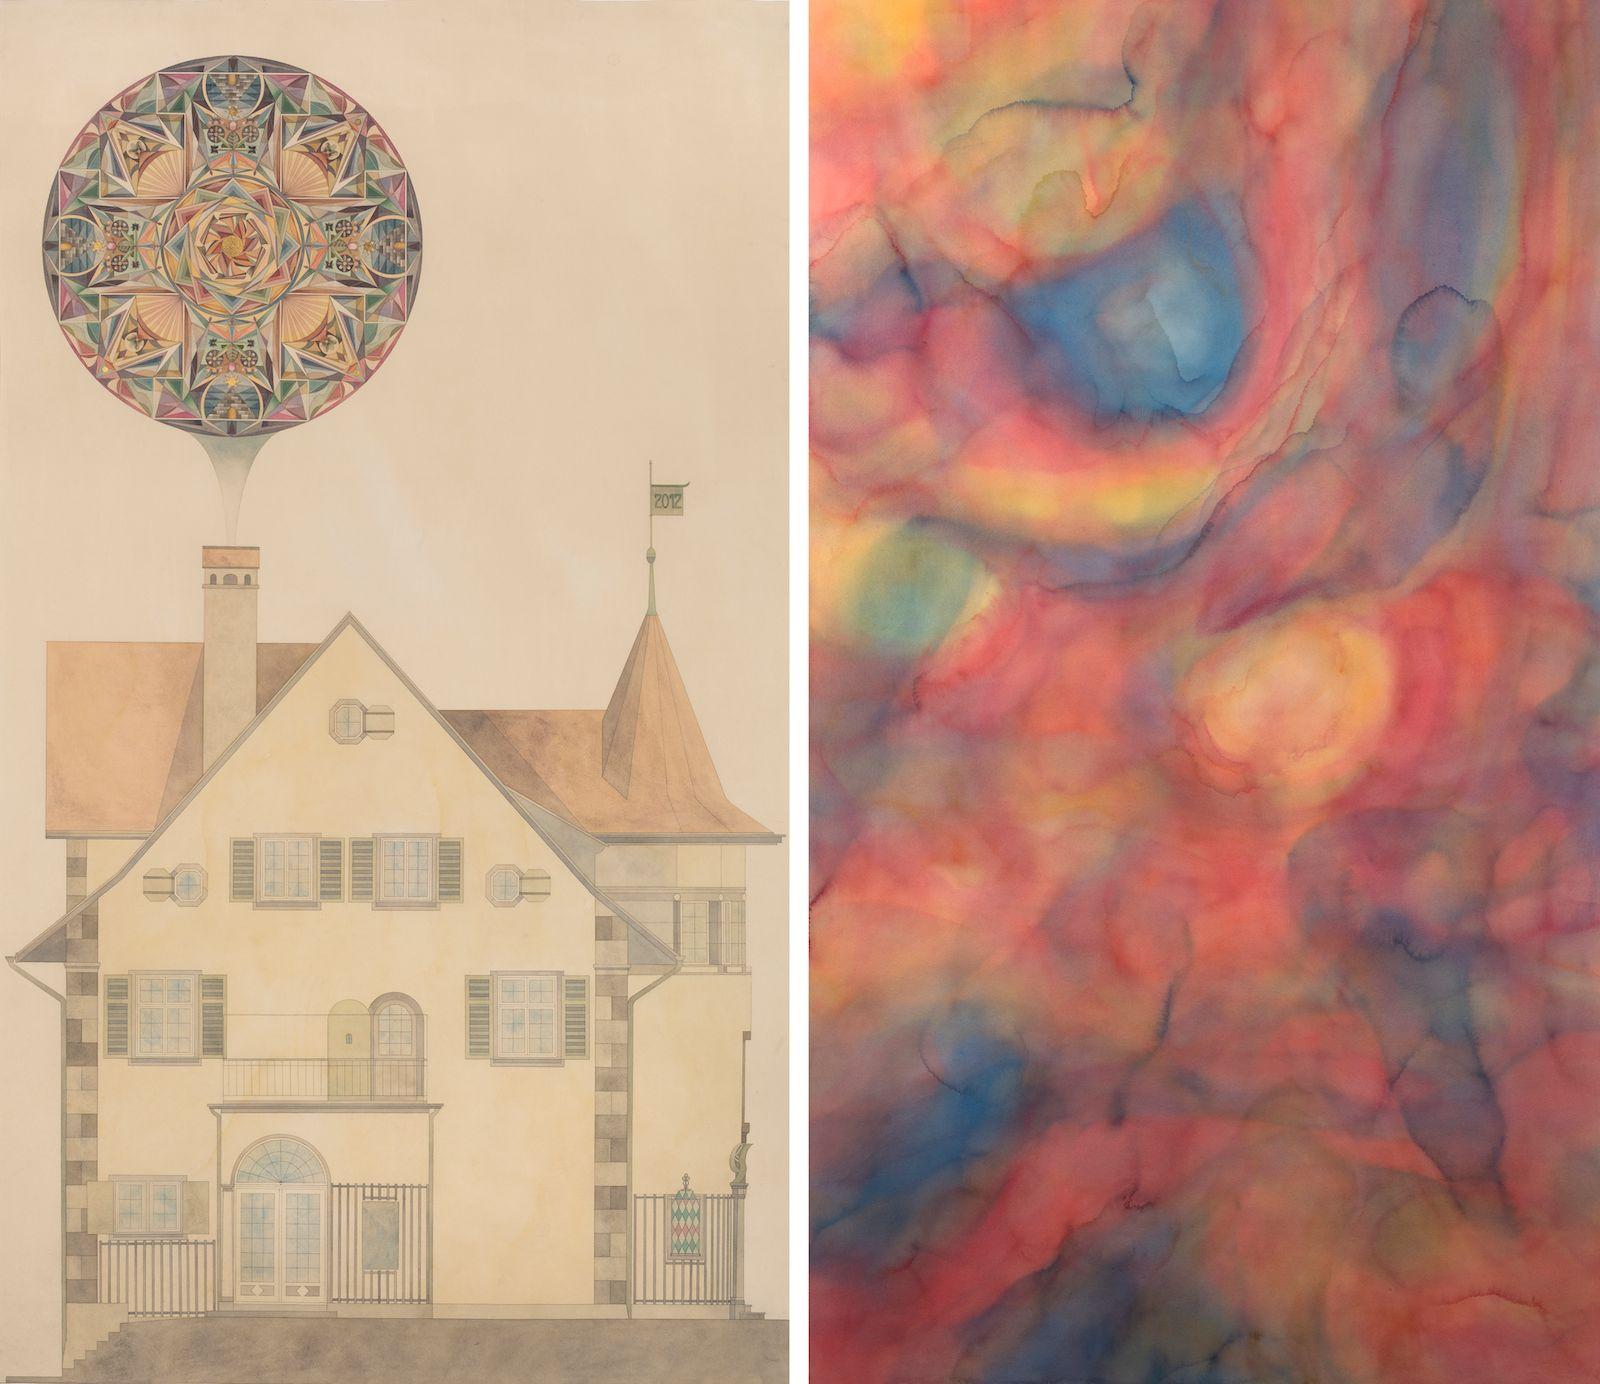 Das Haus des C.G Jungs mit Mandala / Der Traum I, 2012, watercolour and gold-leaf on paper, 198 x 113 / 197 x 114 cm